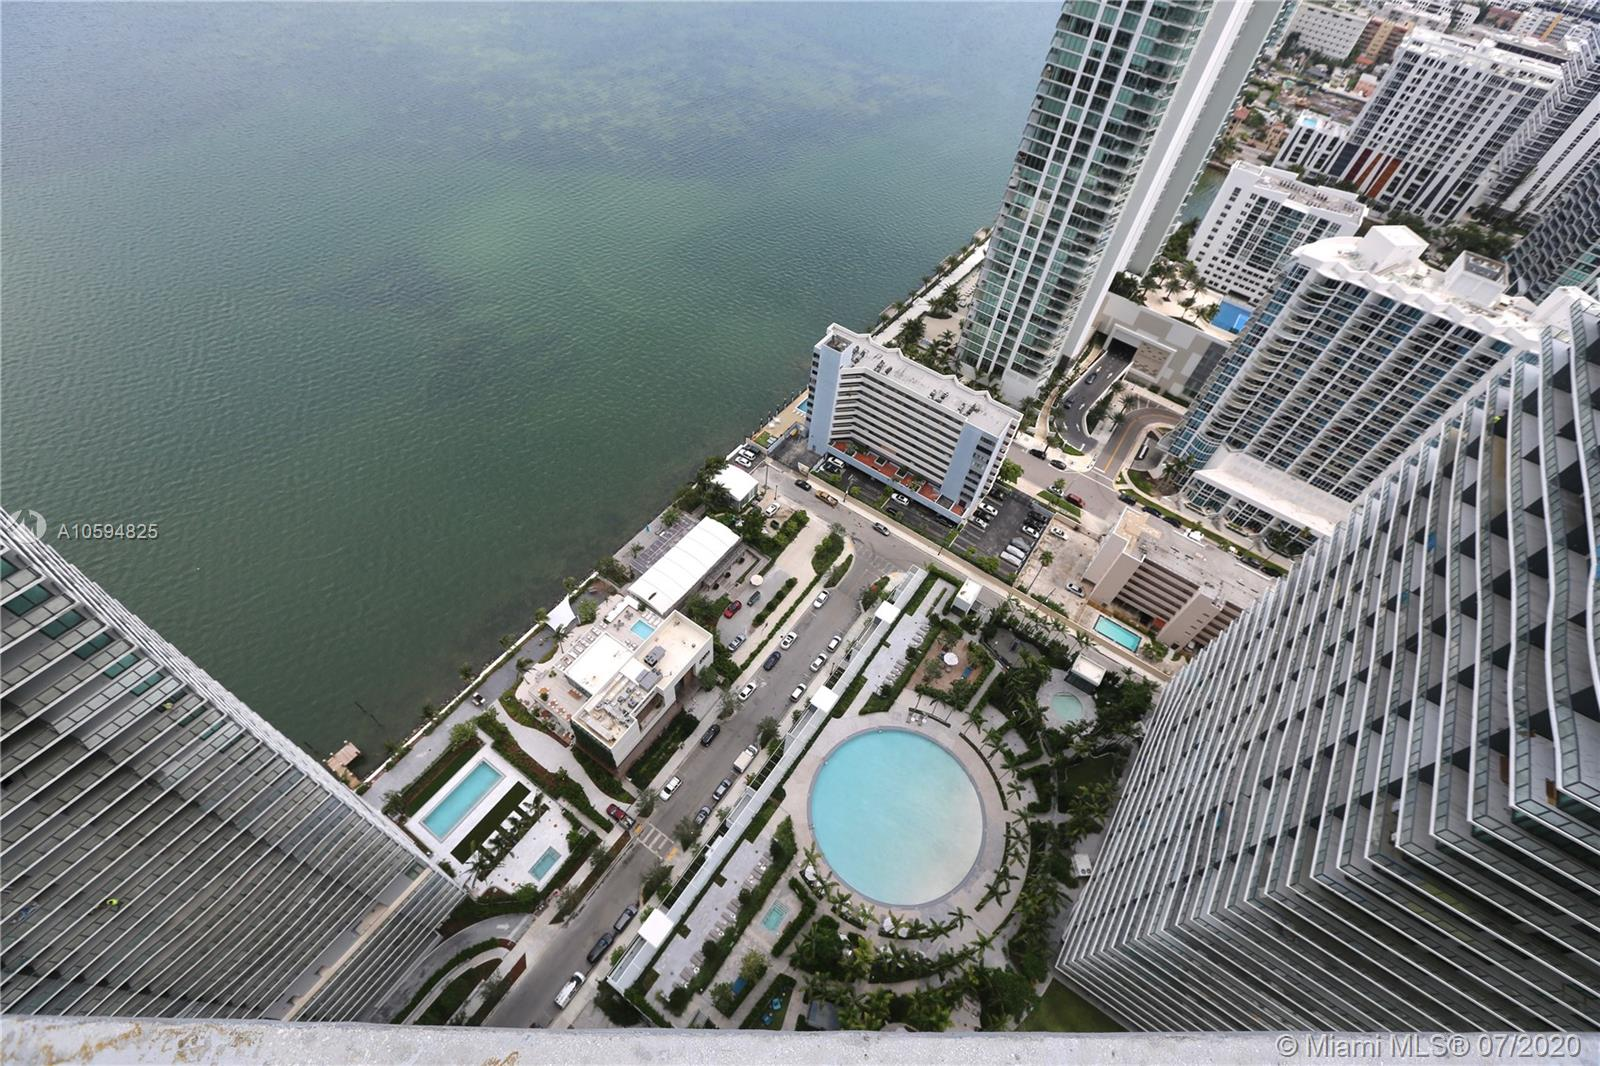 Paraiso Bay #4706 - 650 NE 32 ST #4706, Miami, FL 33137